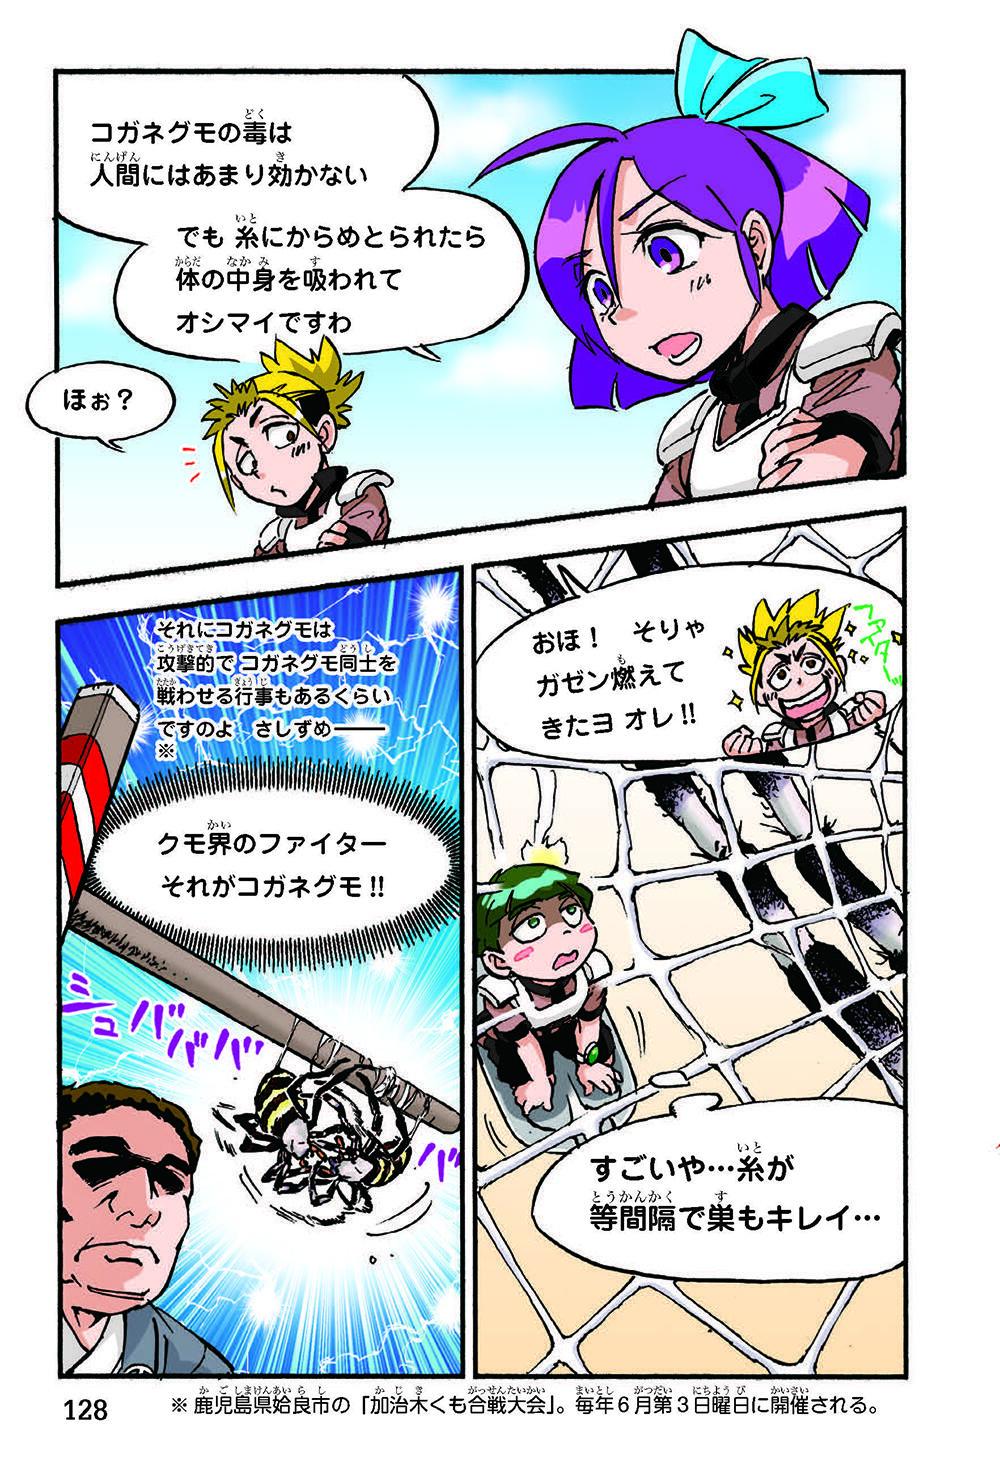 BB_蜊ア髯コ逕溽黄_繝倥z繝シ繧キ繧兩128.jpg